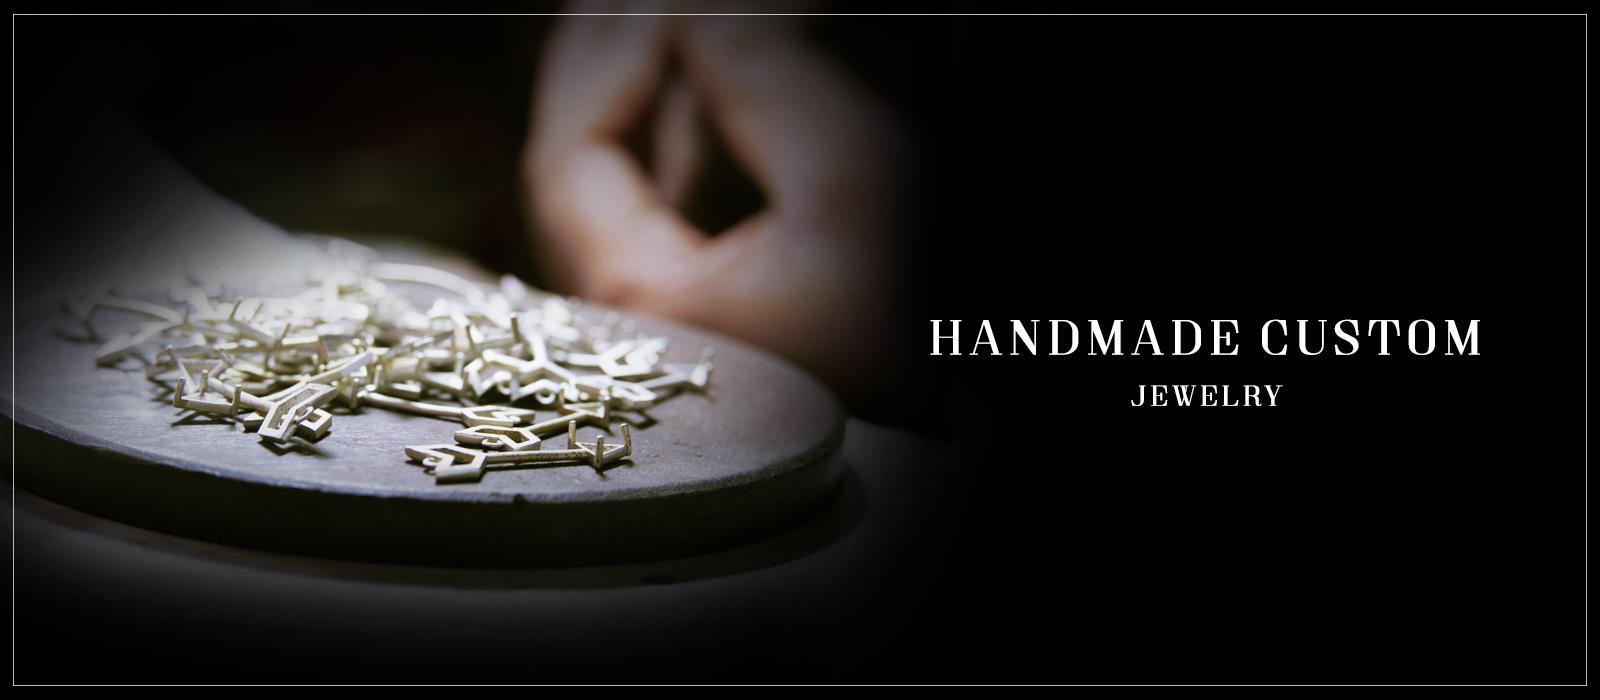 Handmade Jewellery Manufacturer Jaipur, Jaipur Silver Jewelry Manufacturers, Gemstone Jewellery Manufacturer, Designer Jewellery Manufacturer,